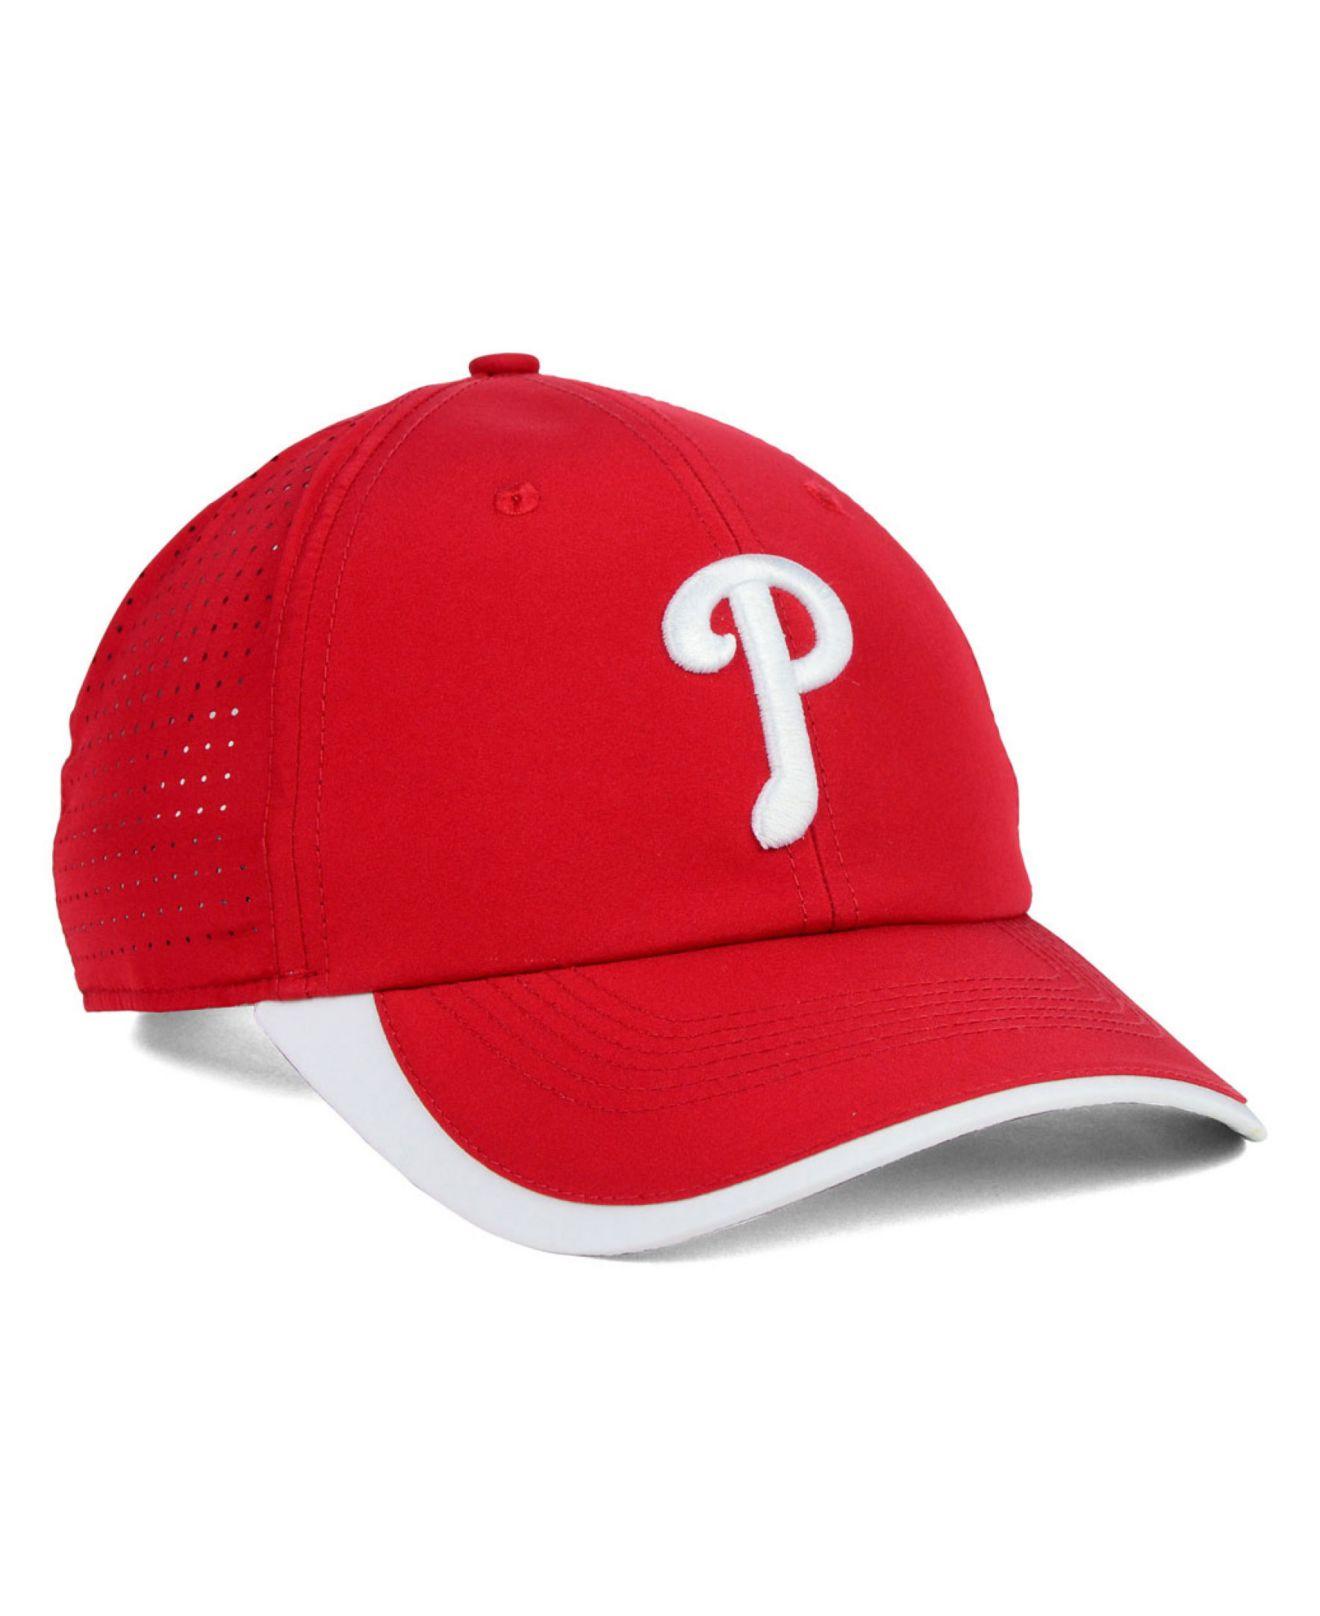 san francisco 41d83 7cd87 Lyst - Nike Philadelphia Phillies Featherlite Cap in Red for Men